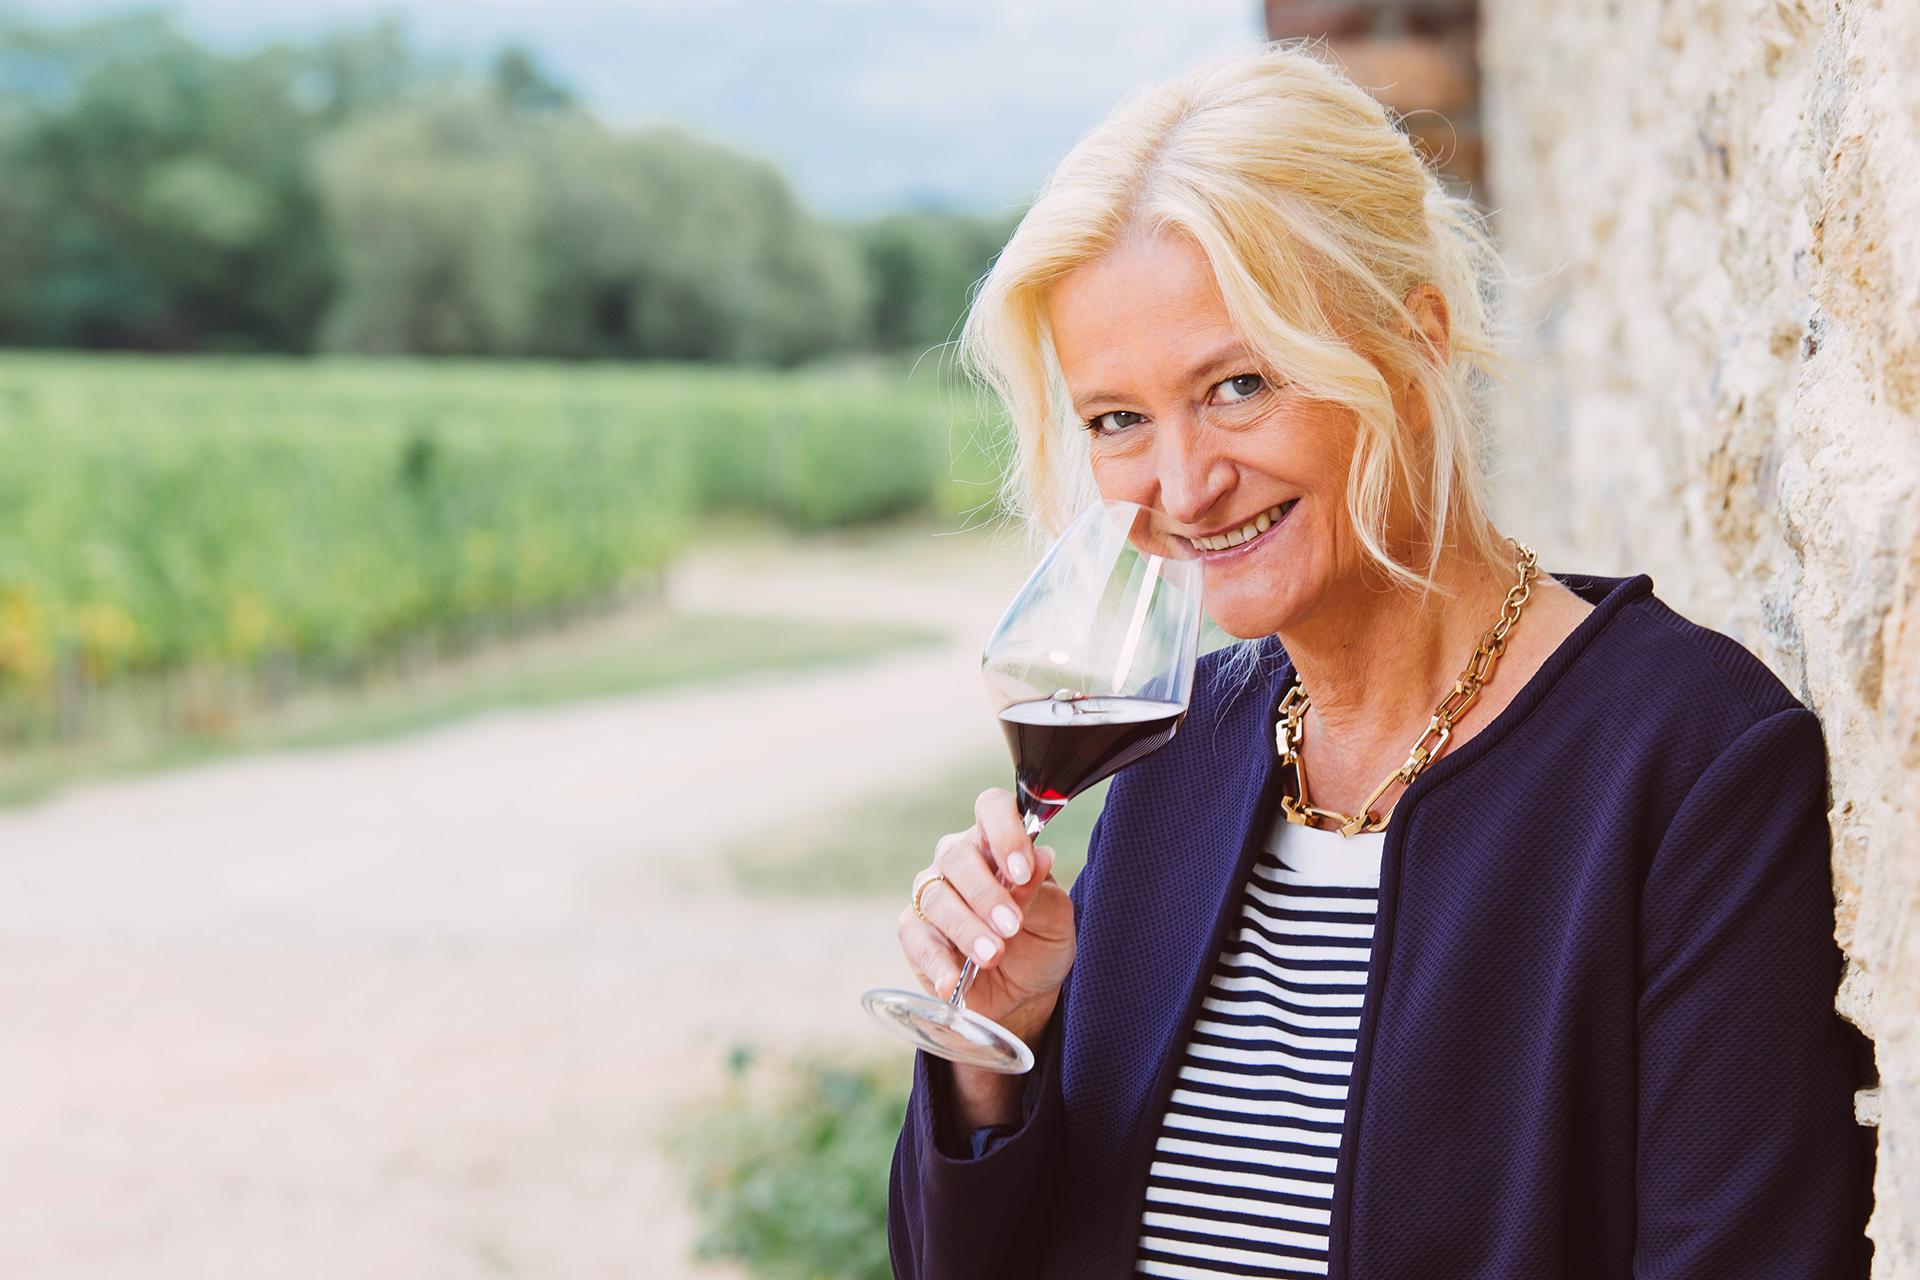 The wine expert